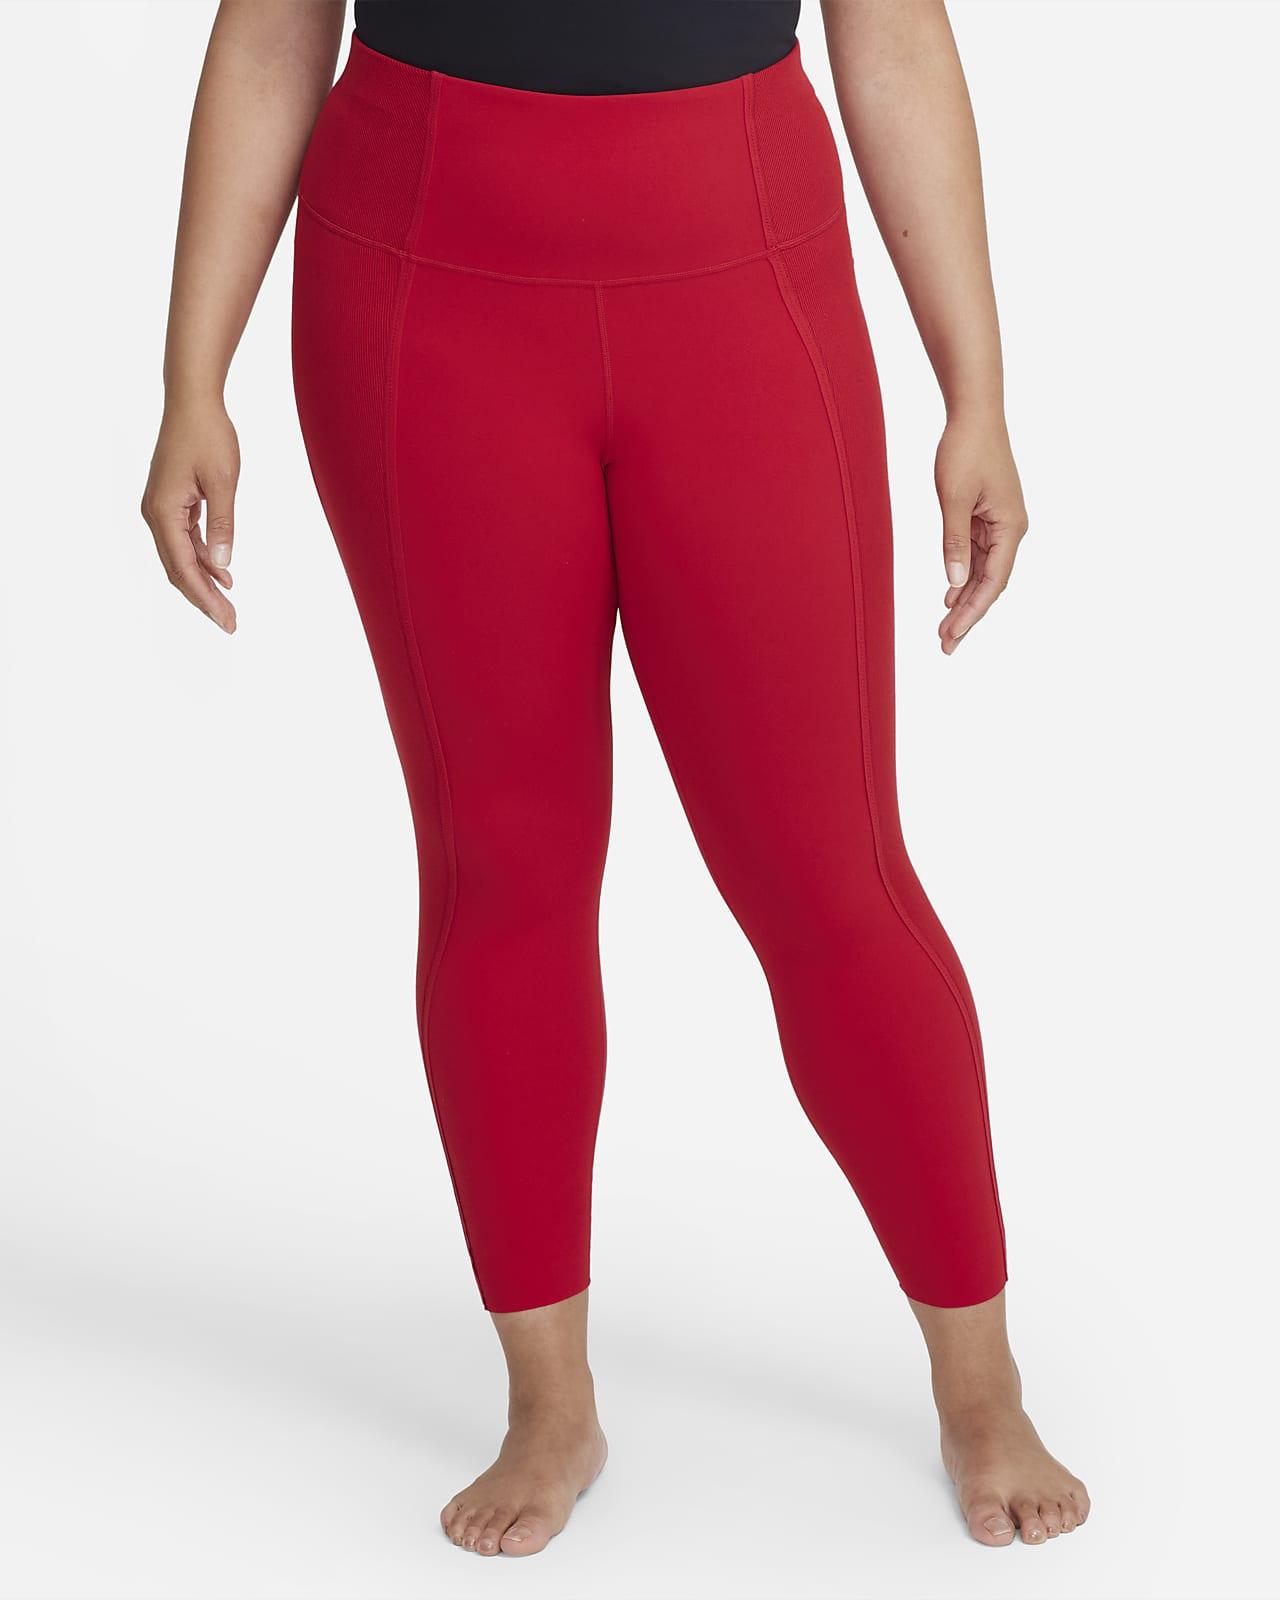 Nike Yoga Luxe Dri-FIT Women's High-Waisted 7/8 Infinalon Leggings (Plus Size)